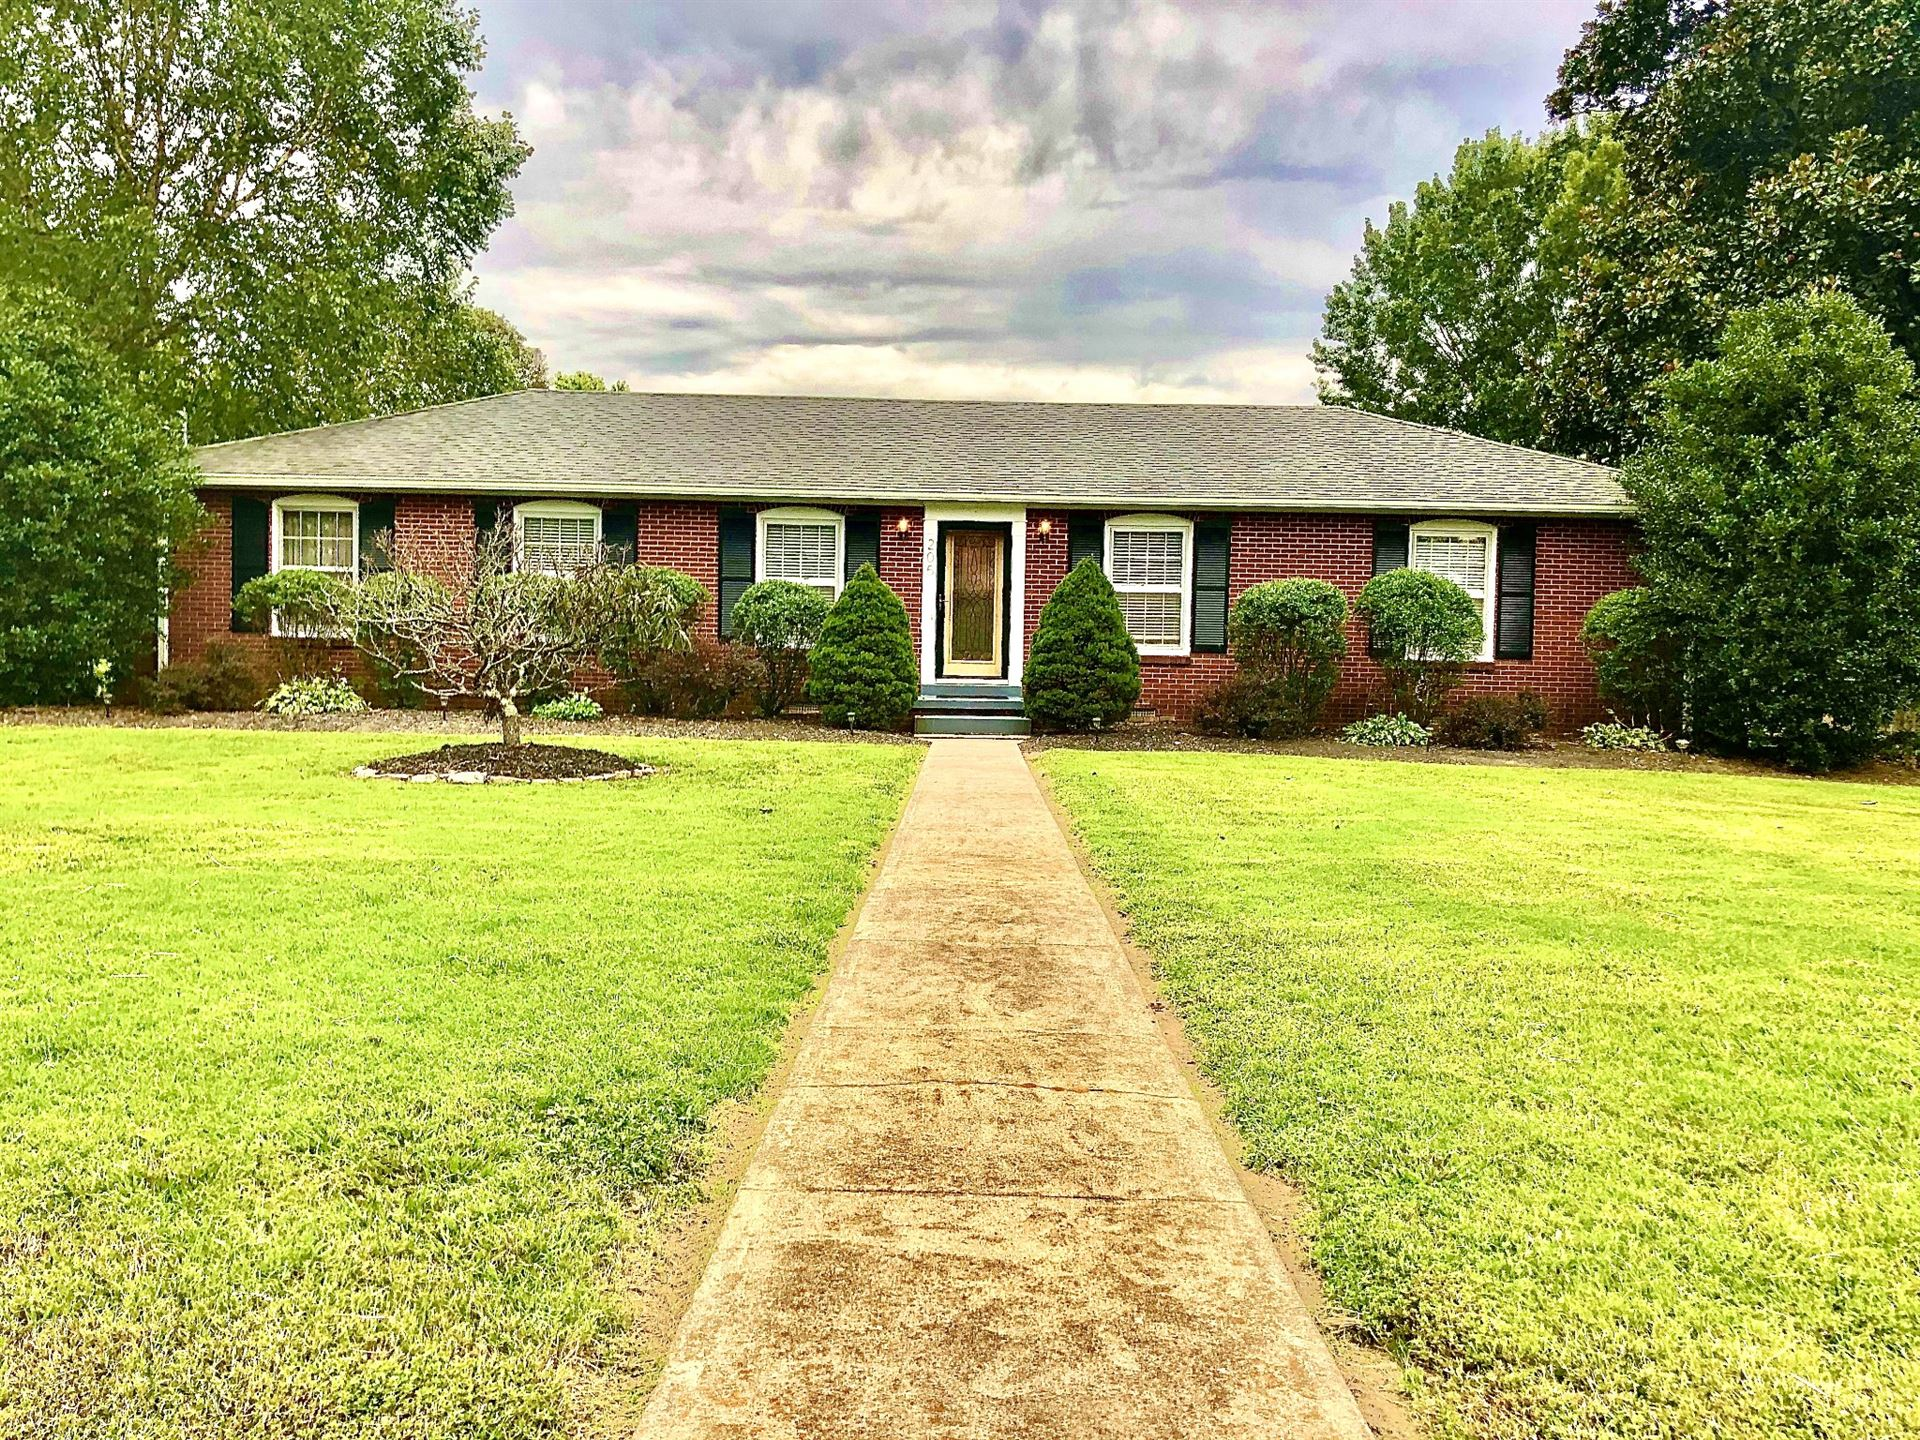 205 Woodmont Dr, Shelbyville, TN 37160 - MLS#: 2191381